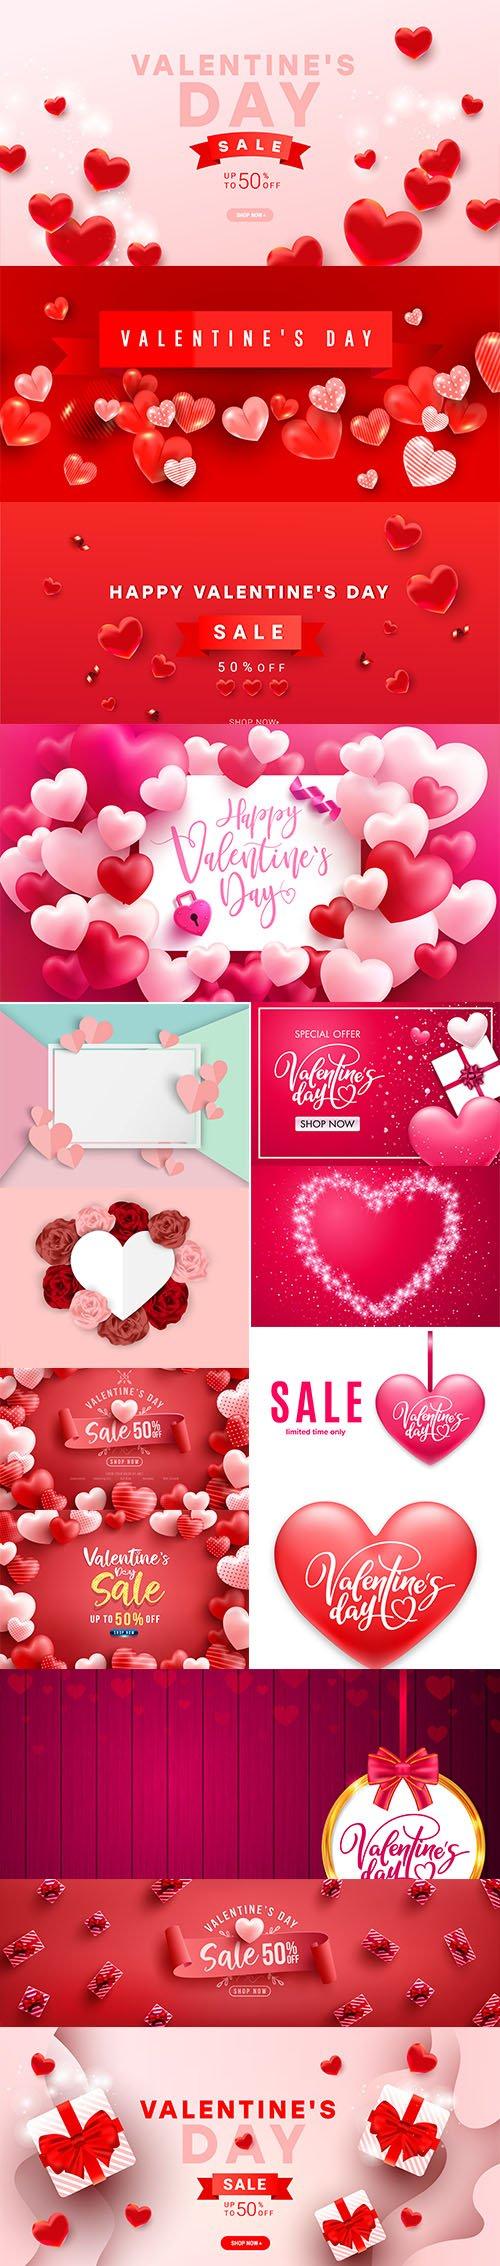 Set of Romantic Valentines Day Illustrations Vol 4